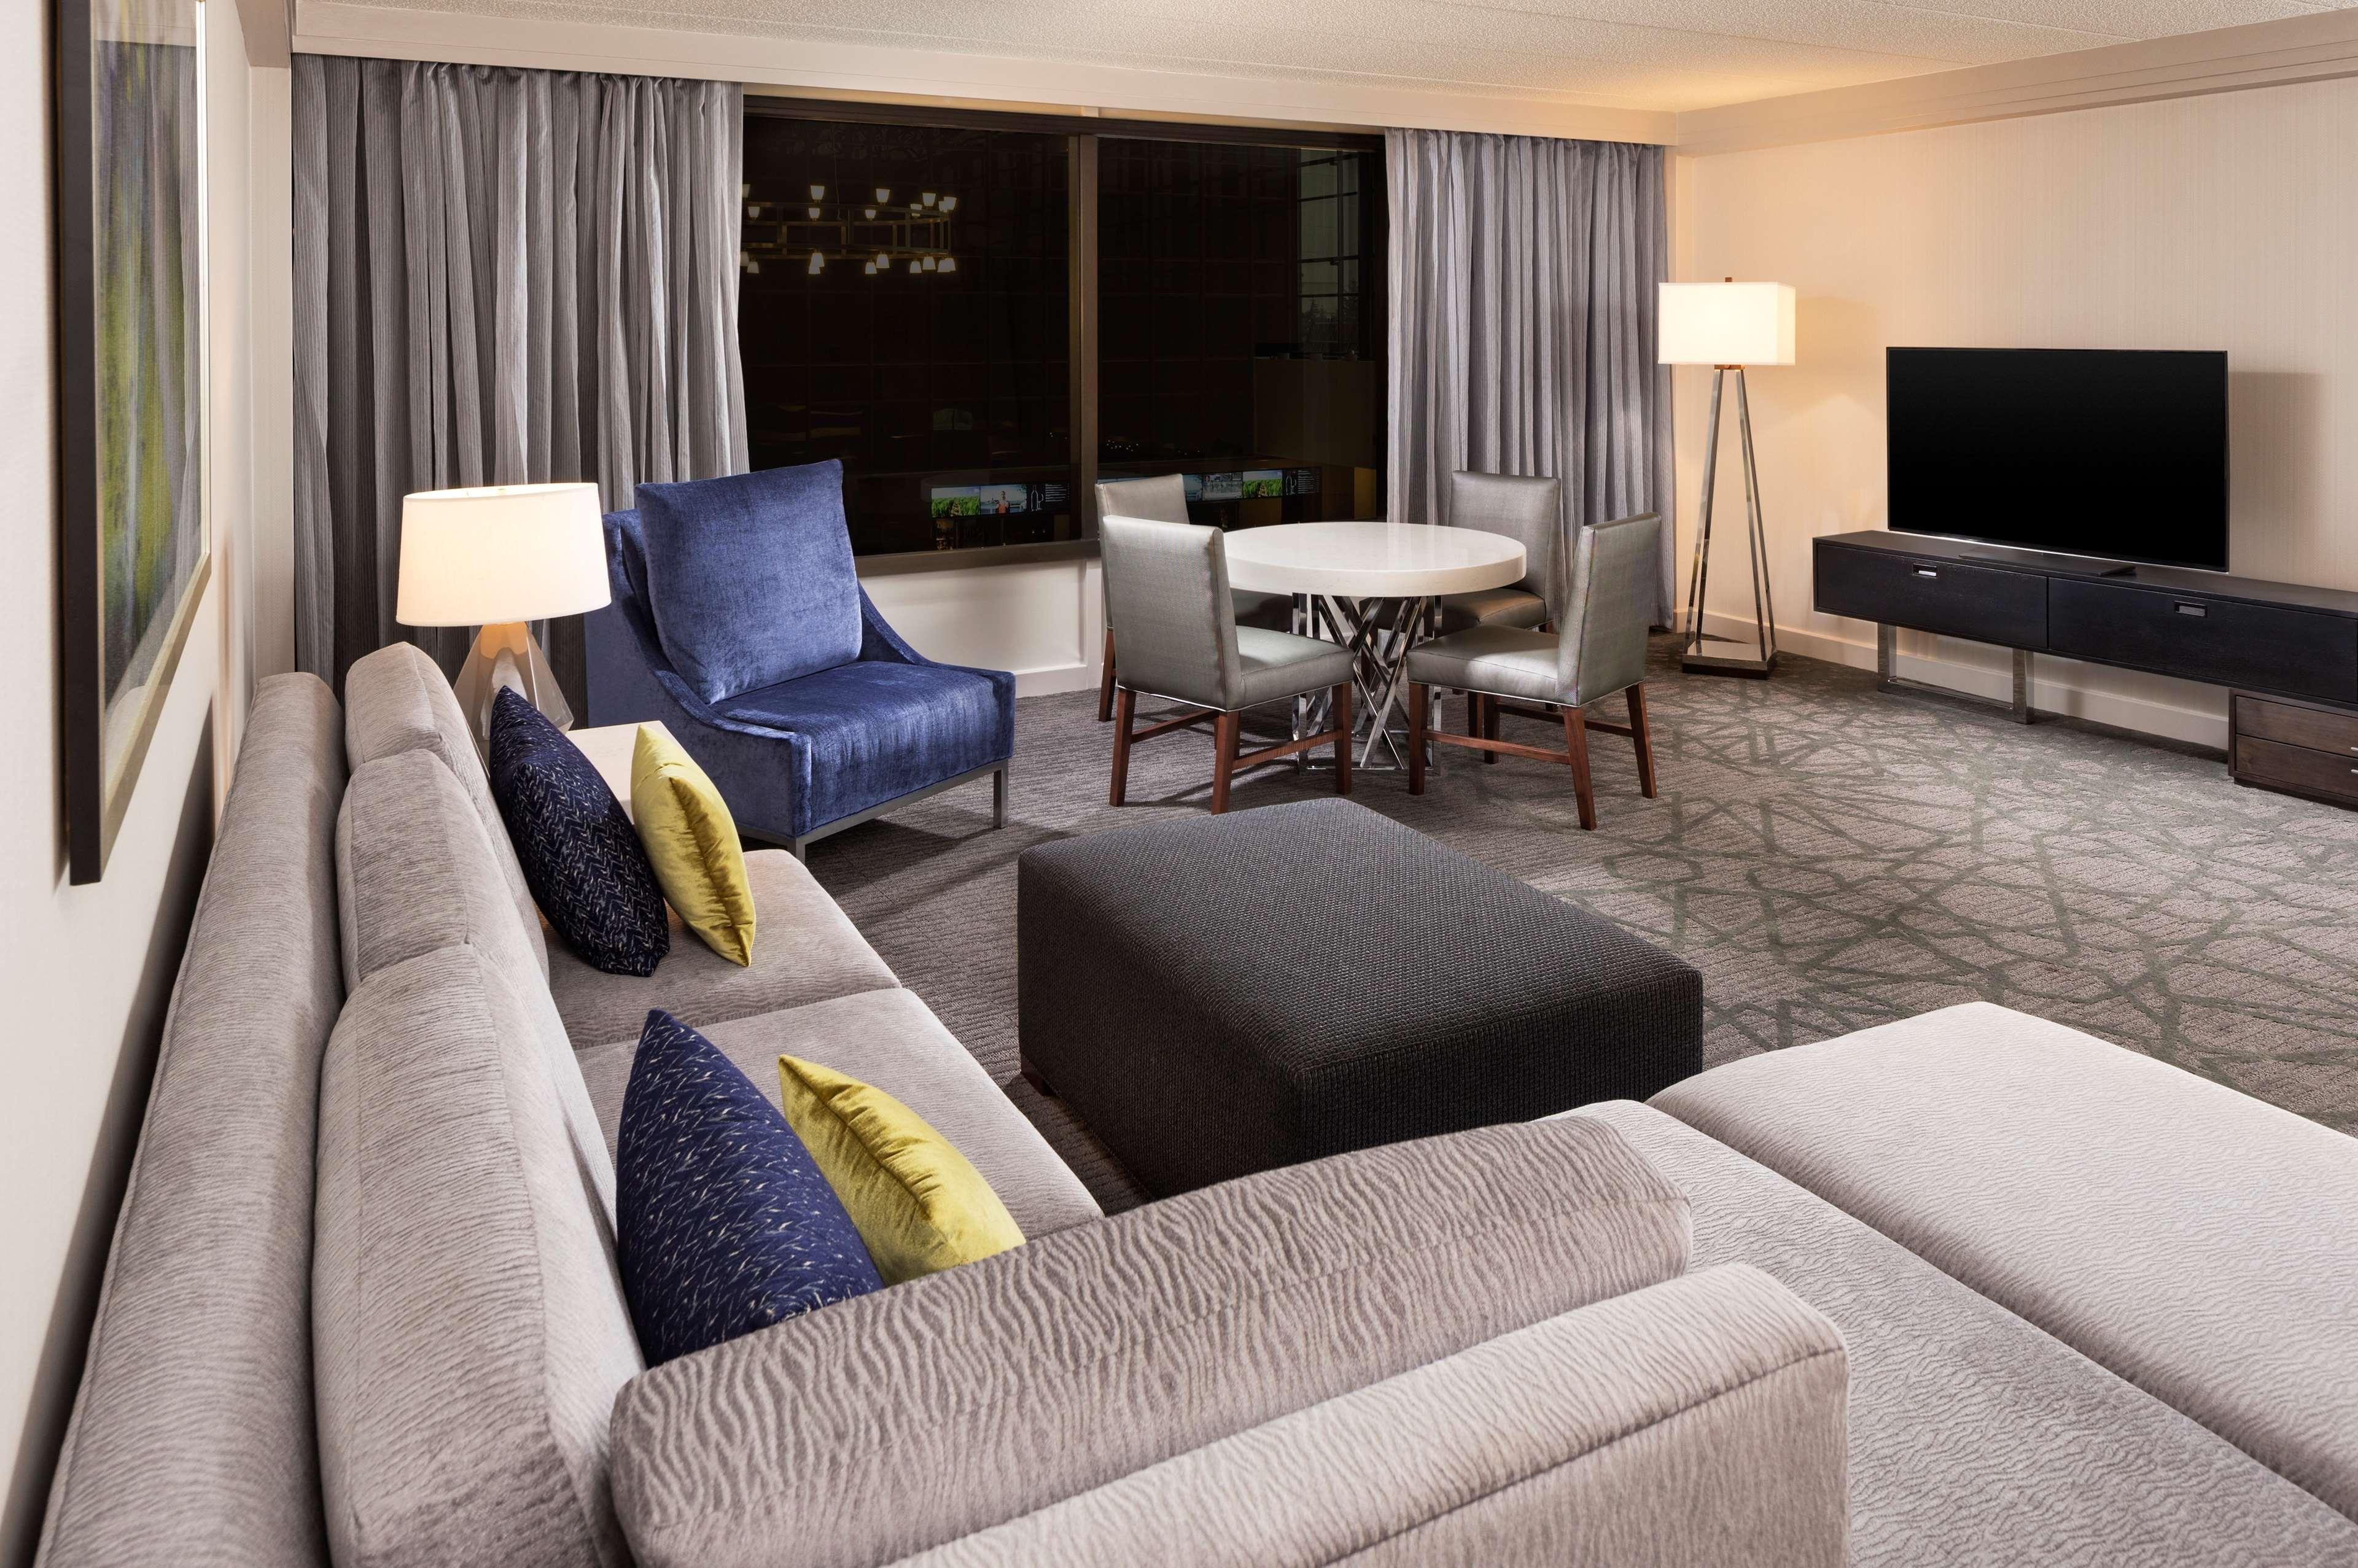 Sheraton Bloomington Hotel image 17